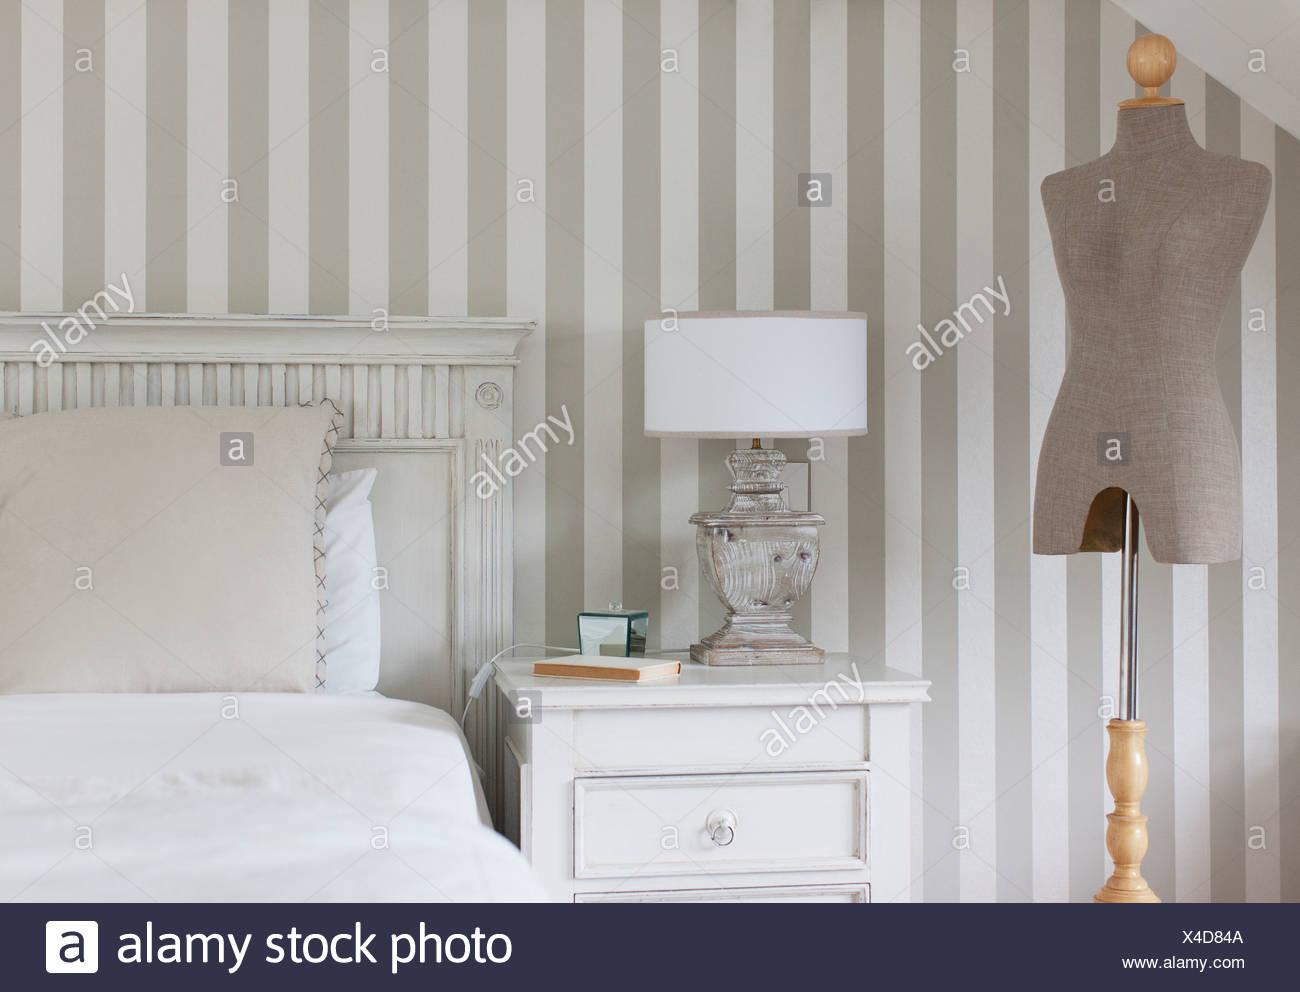 Dressmakers model and bed in feminine bedroom - Stock Image